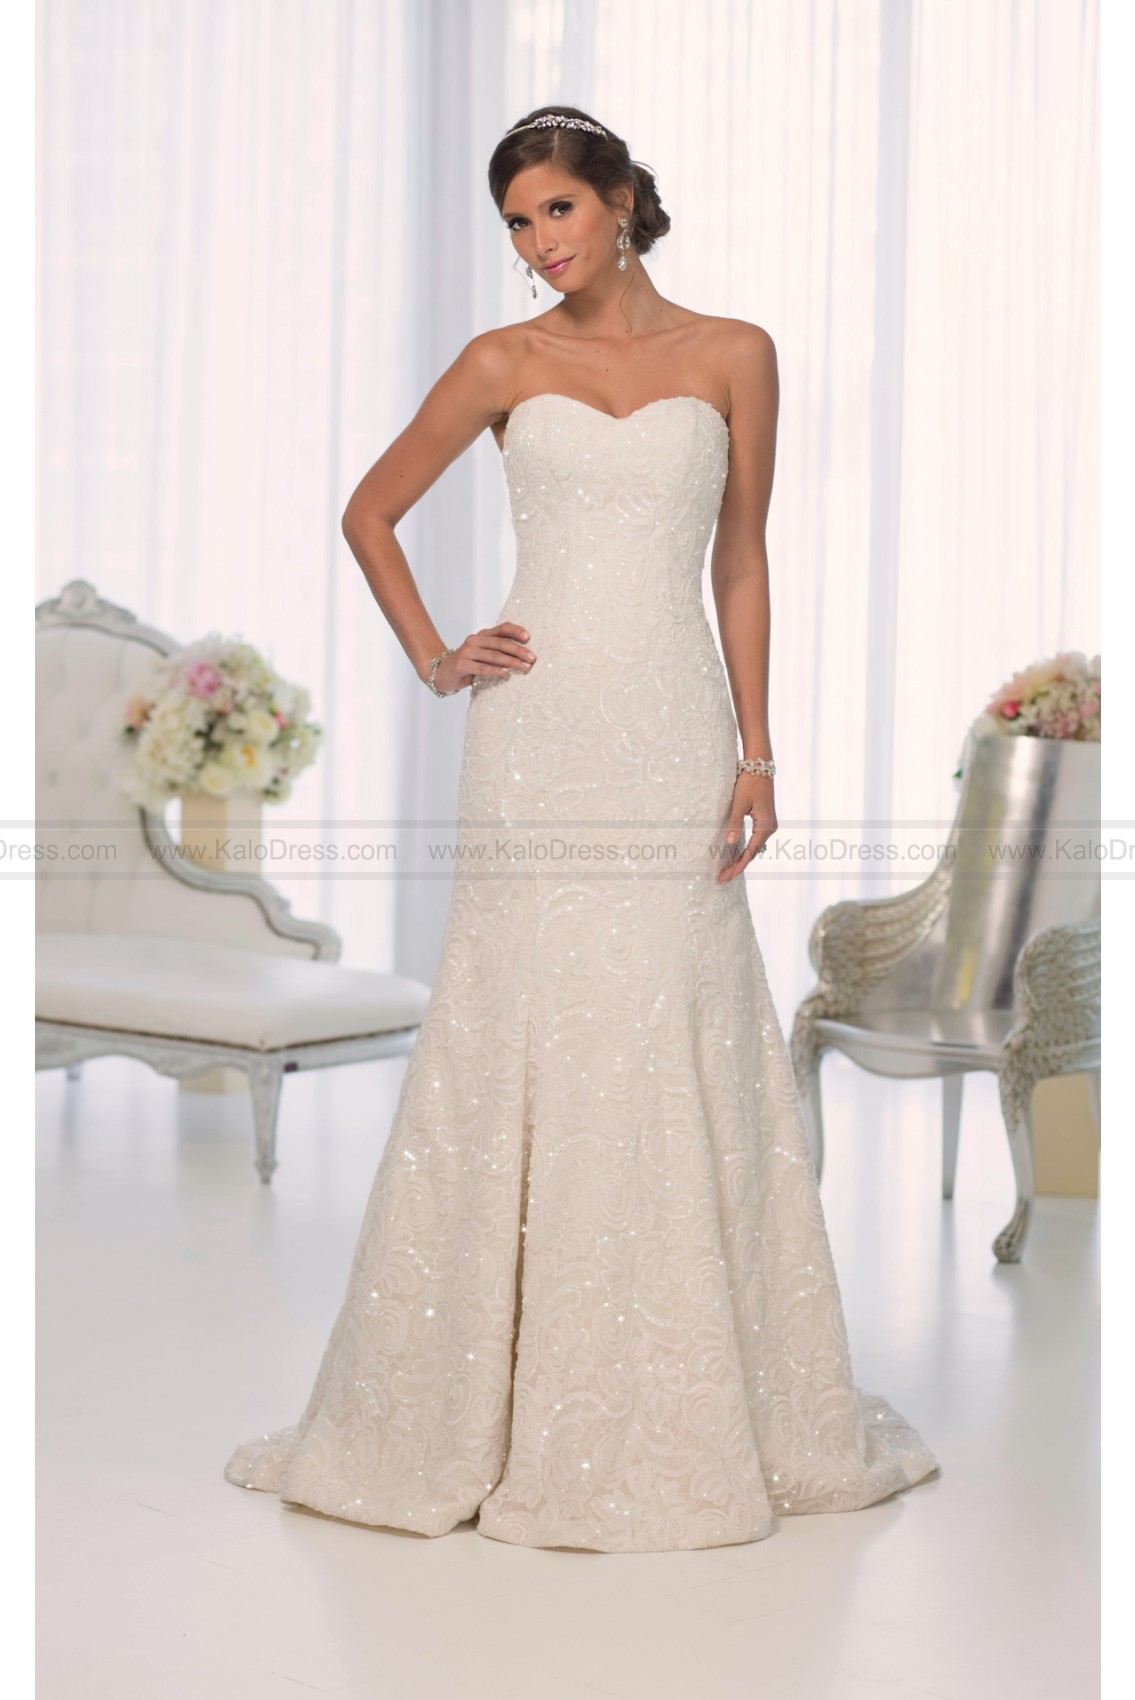 Essense Wedding dress Style D1637 - Formal Wedding Dresses